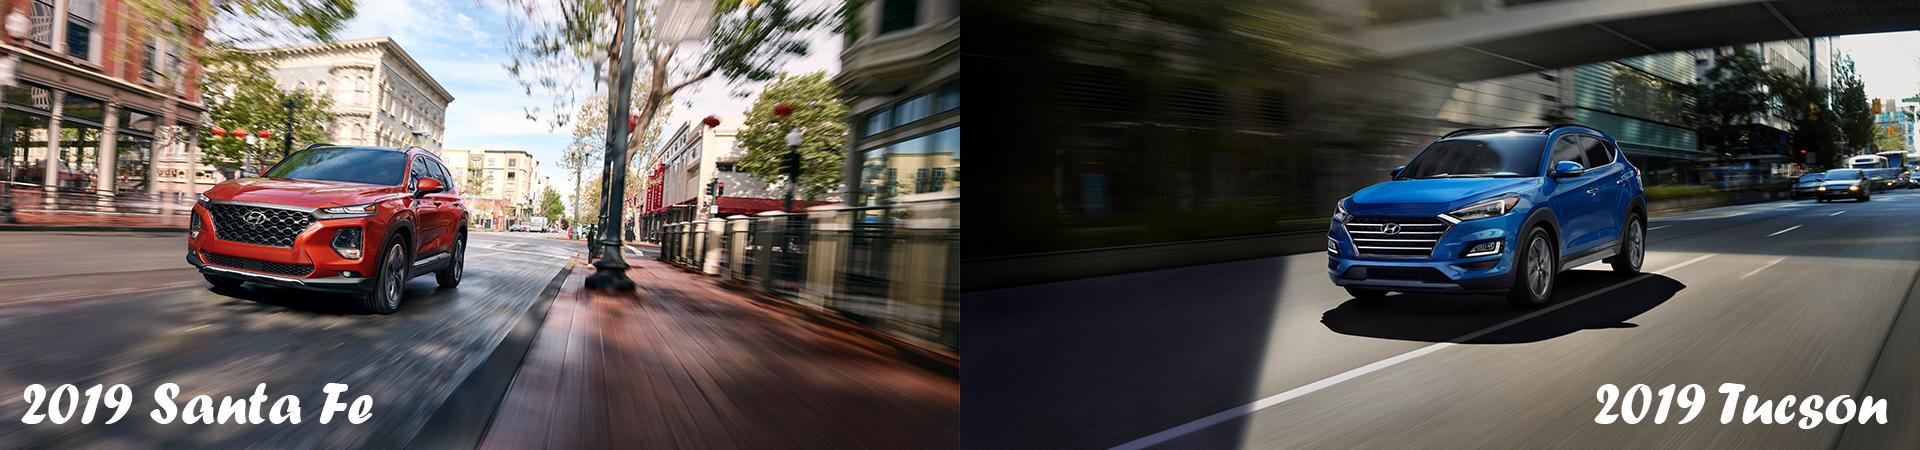 Performance Features of the 2019 Hyundai Santa Fe and 2019 Hyundai Tucson | Freedom Hyundai of Hamburg